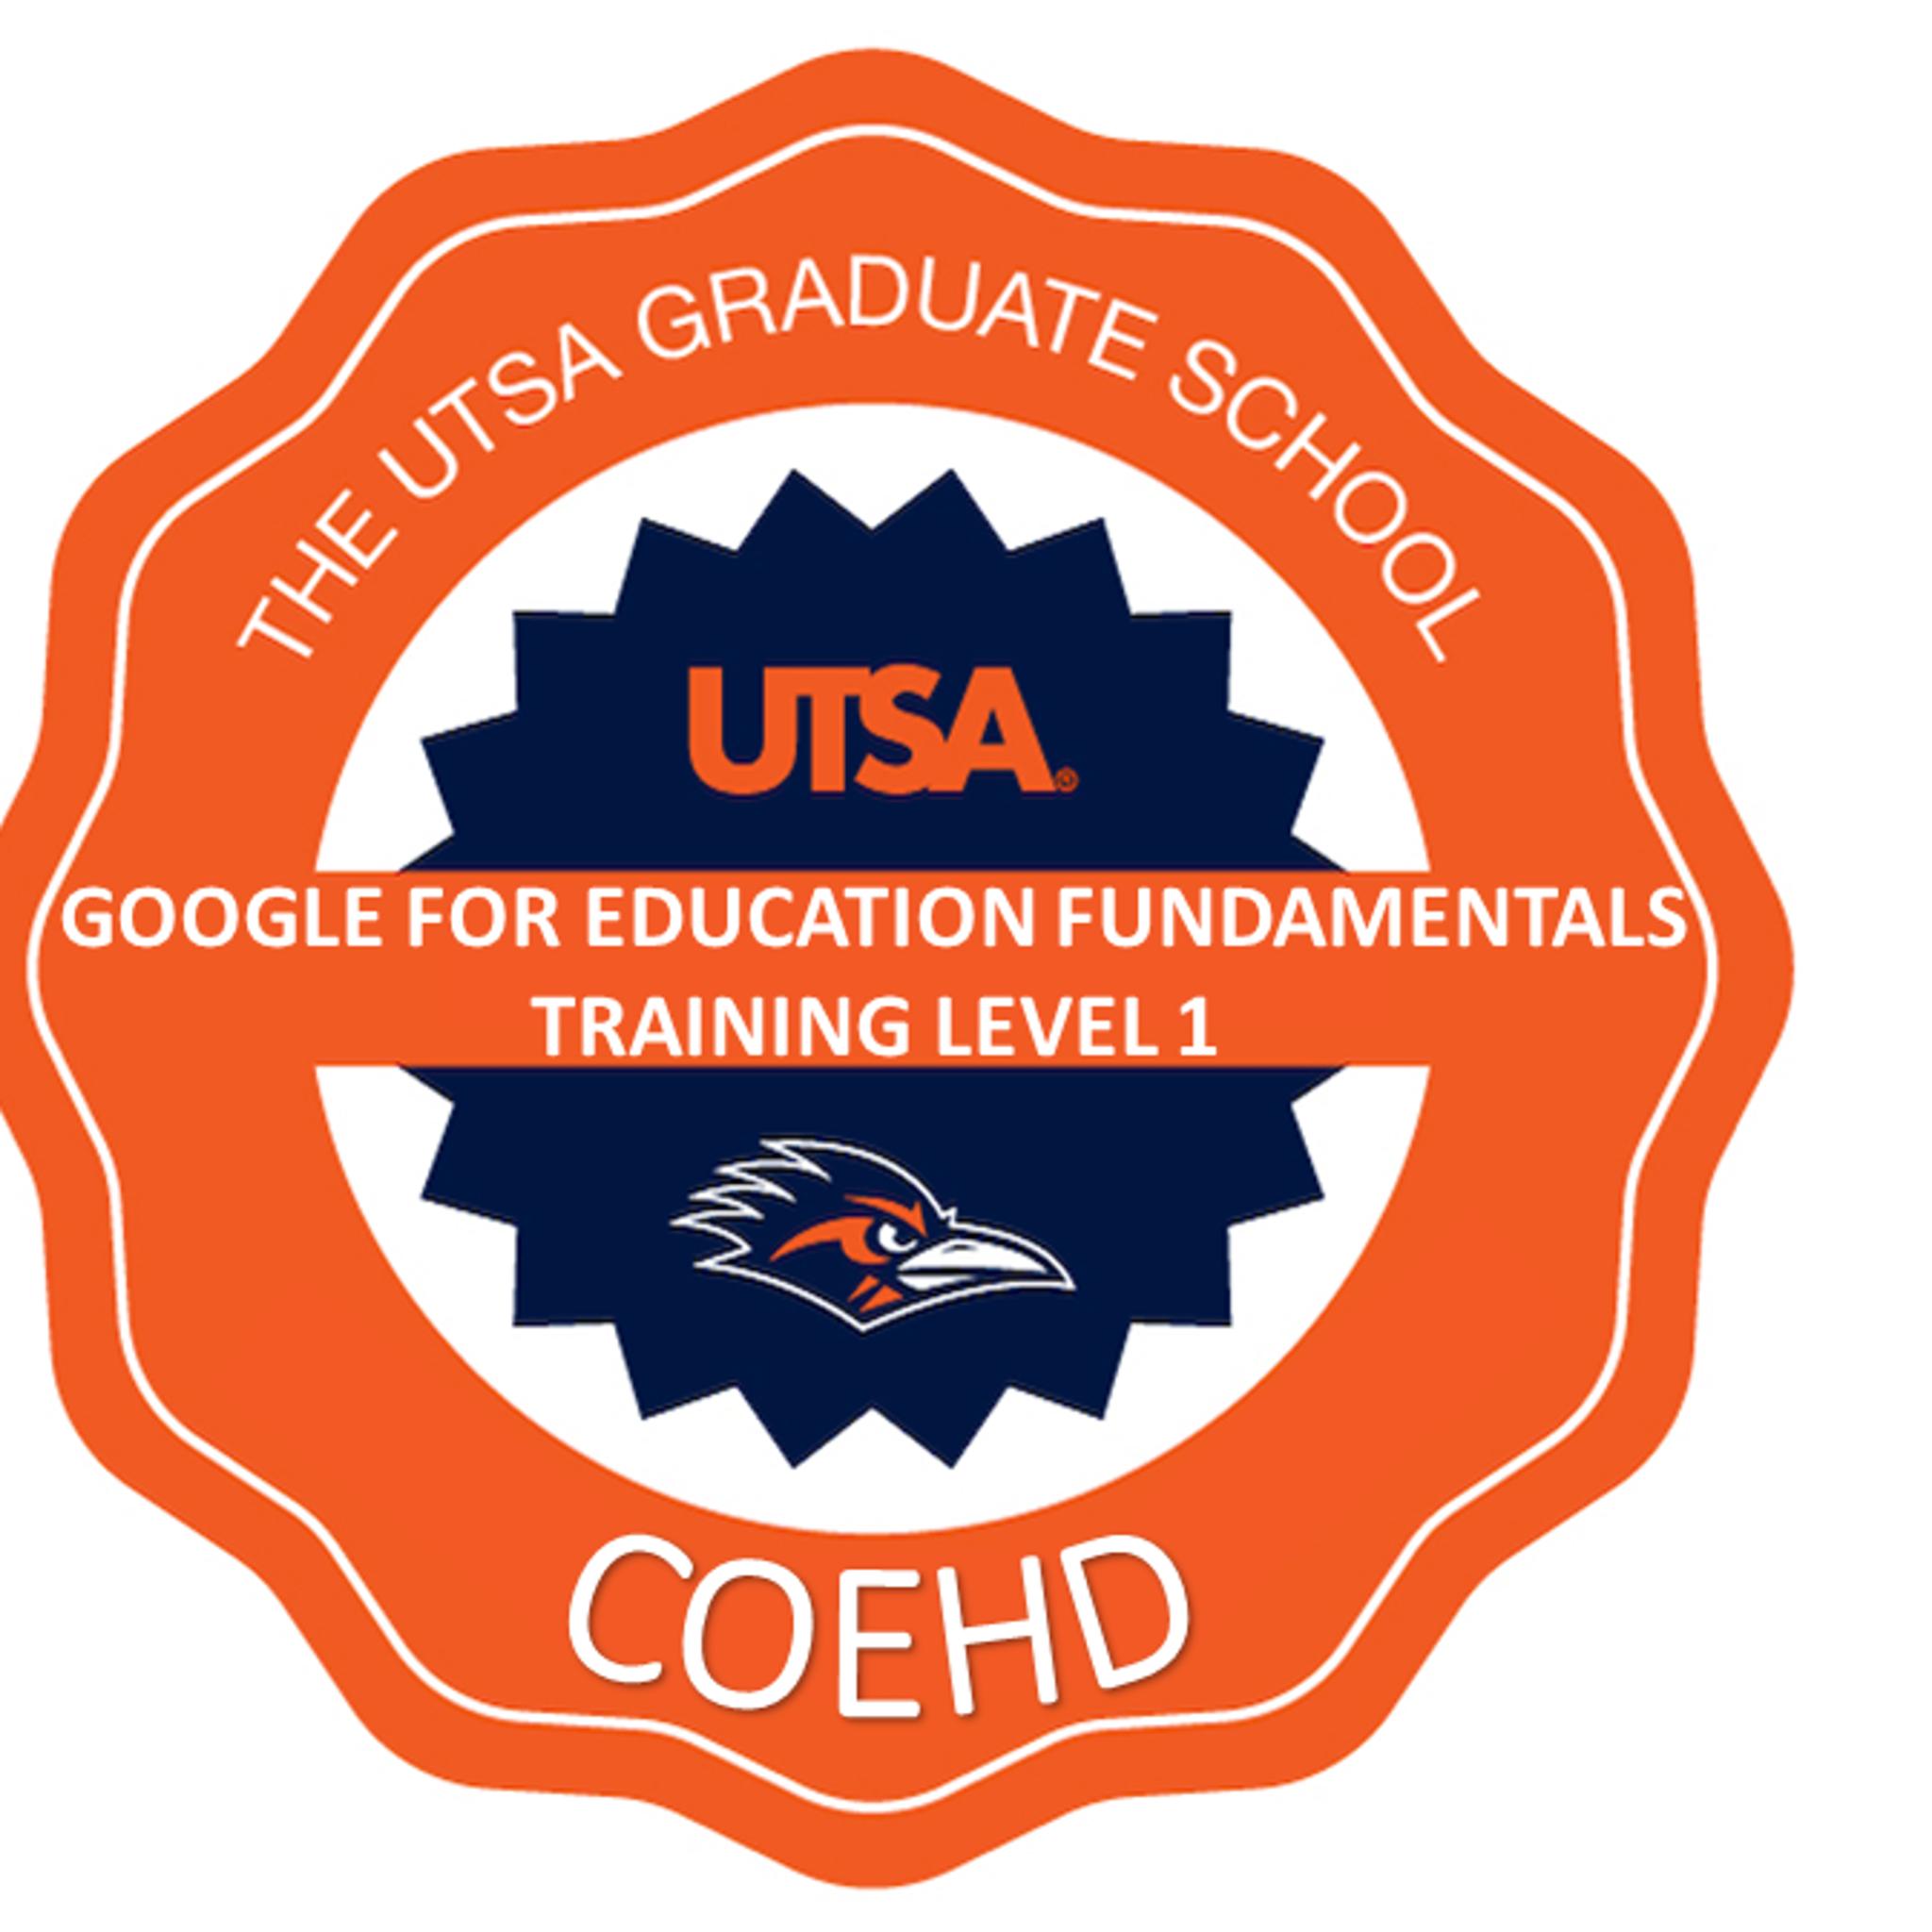 COEHD: Google for Education Fundamentals Training Level 1